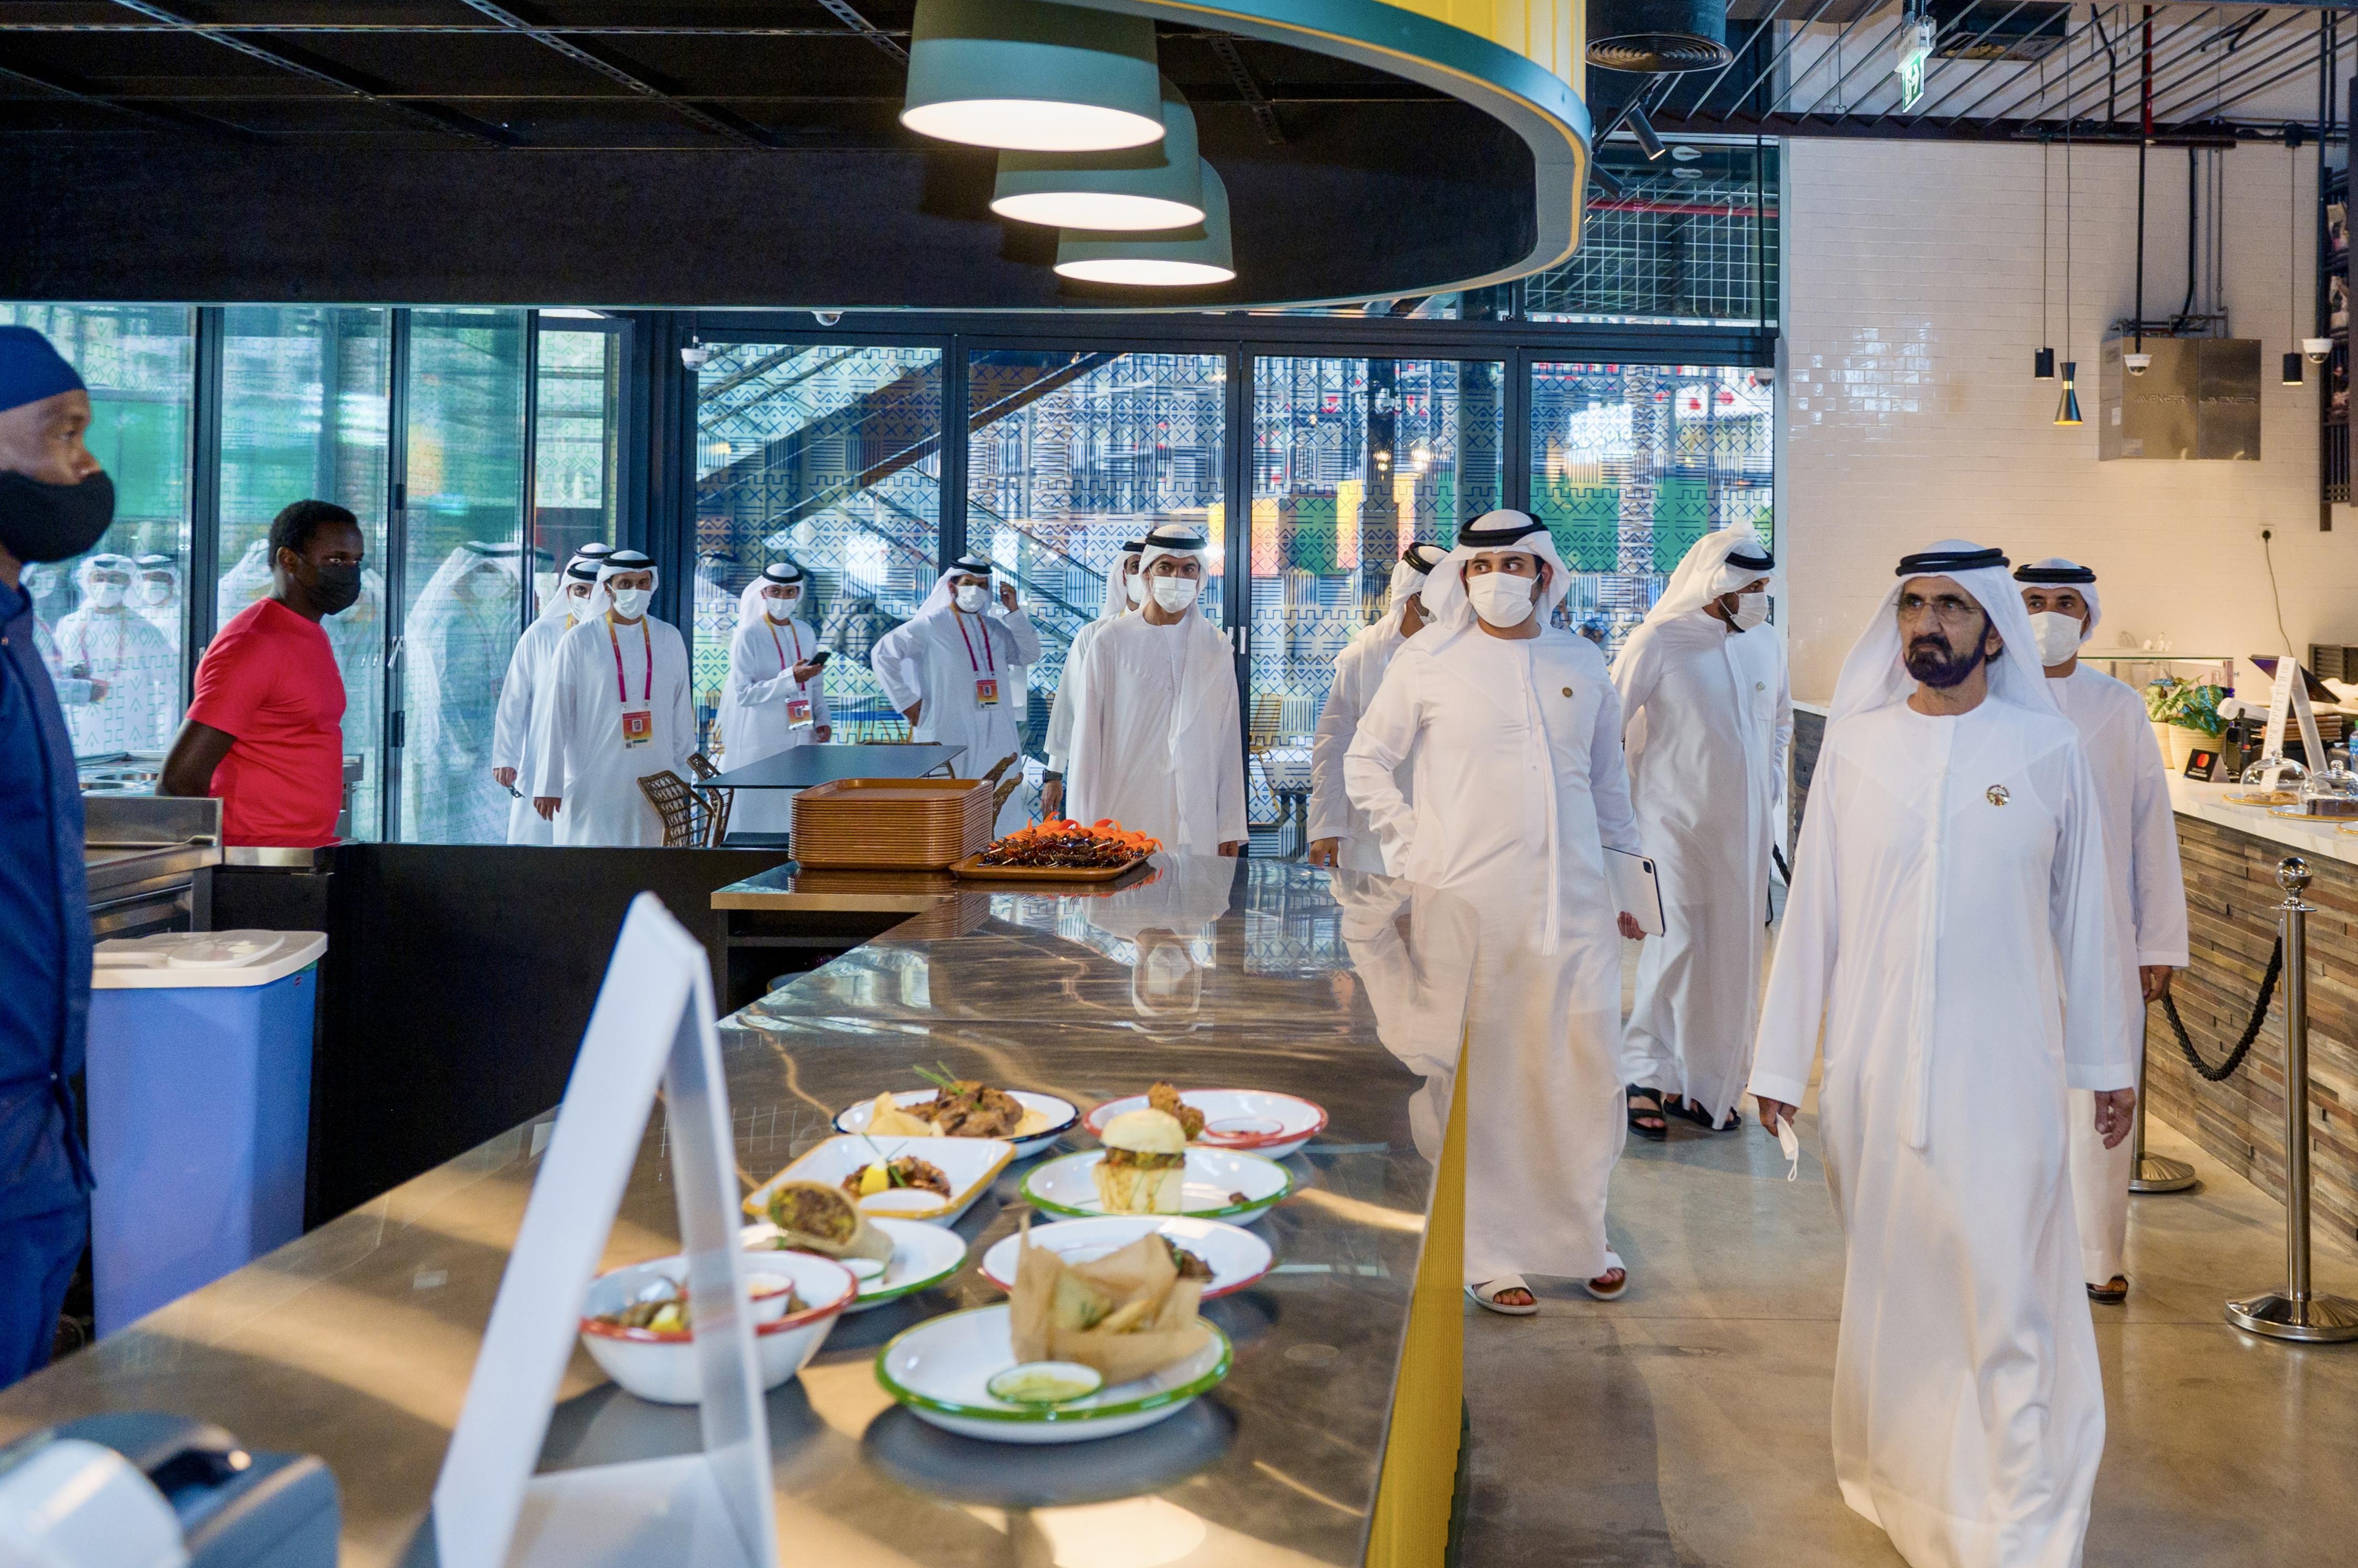 His Highness Sheikh Mohammed bin Rashid Al Maktoum - Mohammed bin Rashid visits African dining hall Alkebulan at Expo 2020 Dubai